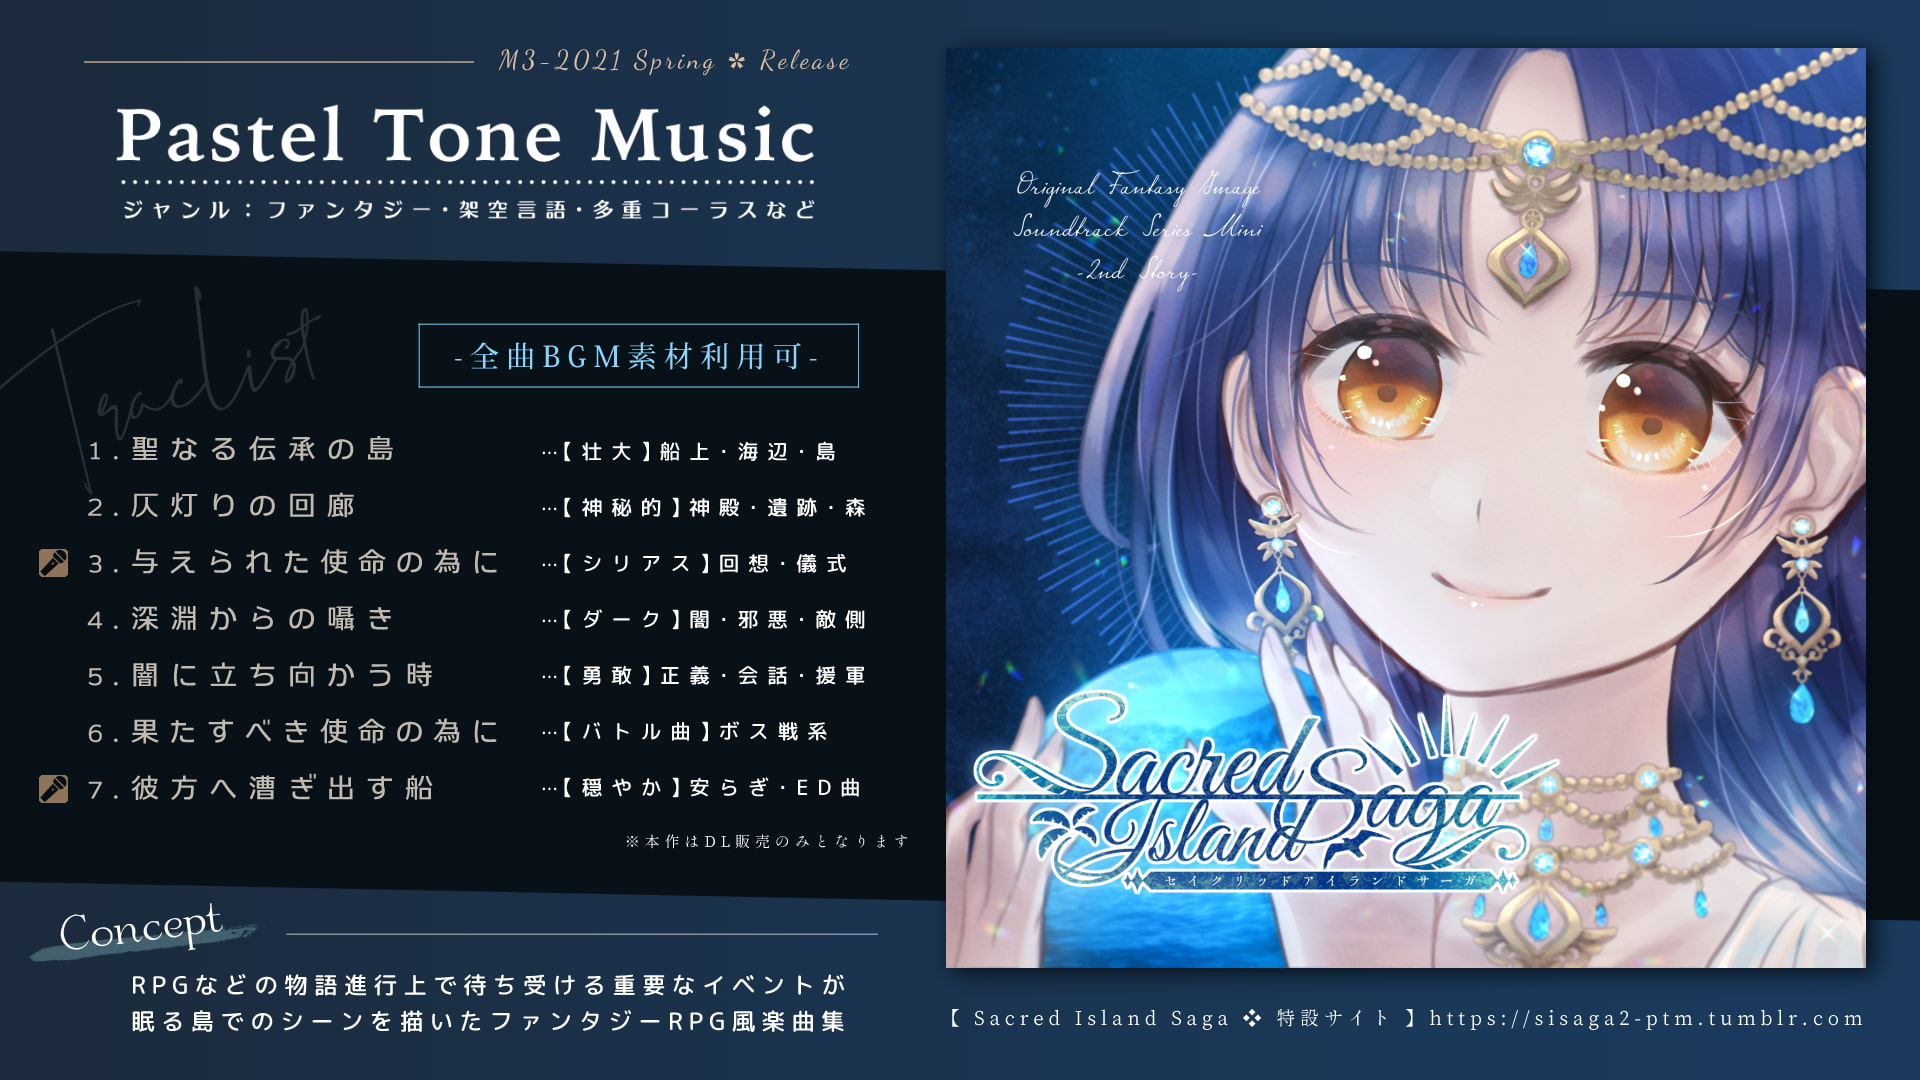 【BGM素材集】Sacred Island Saga【ボーカル楽曲あり・ファンタジーRPG風】